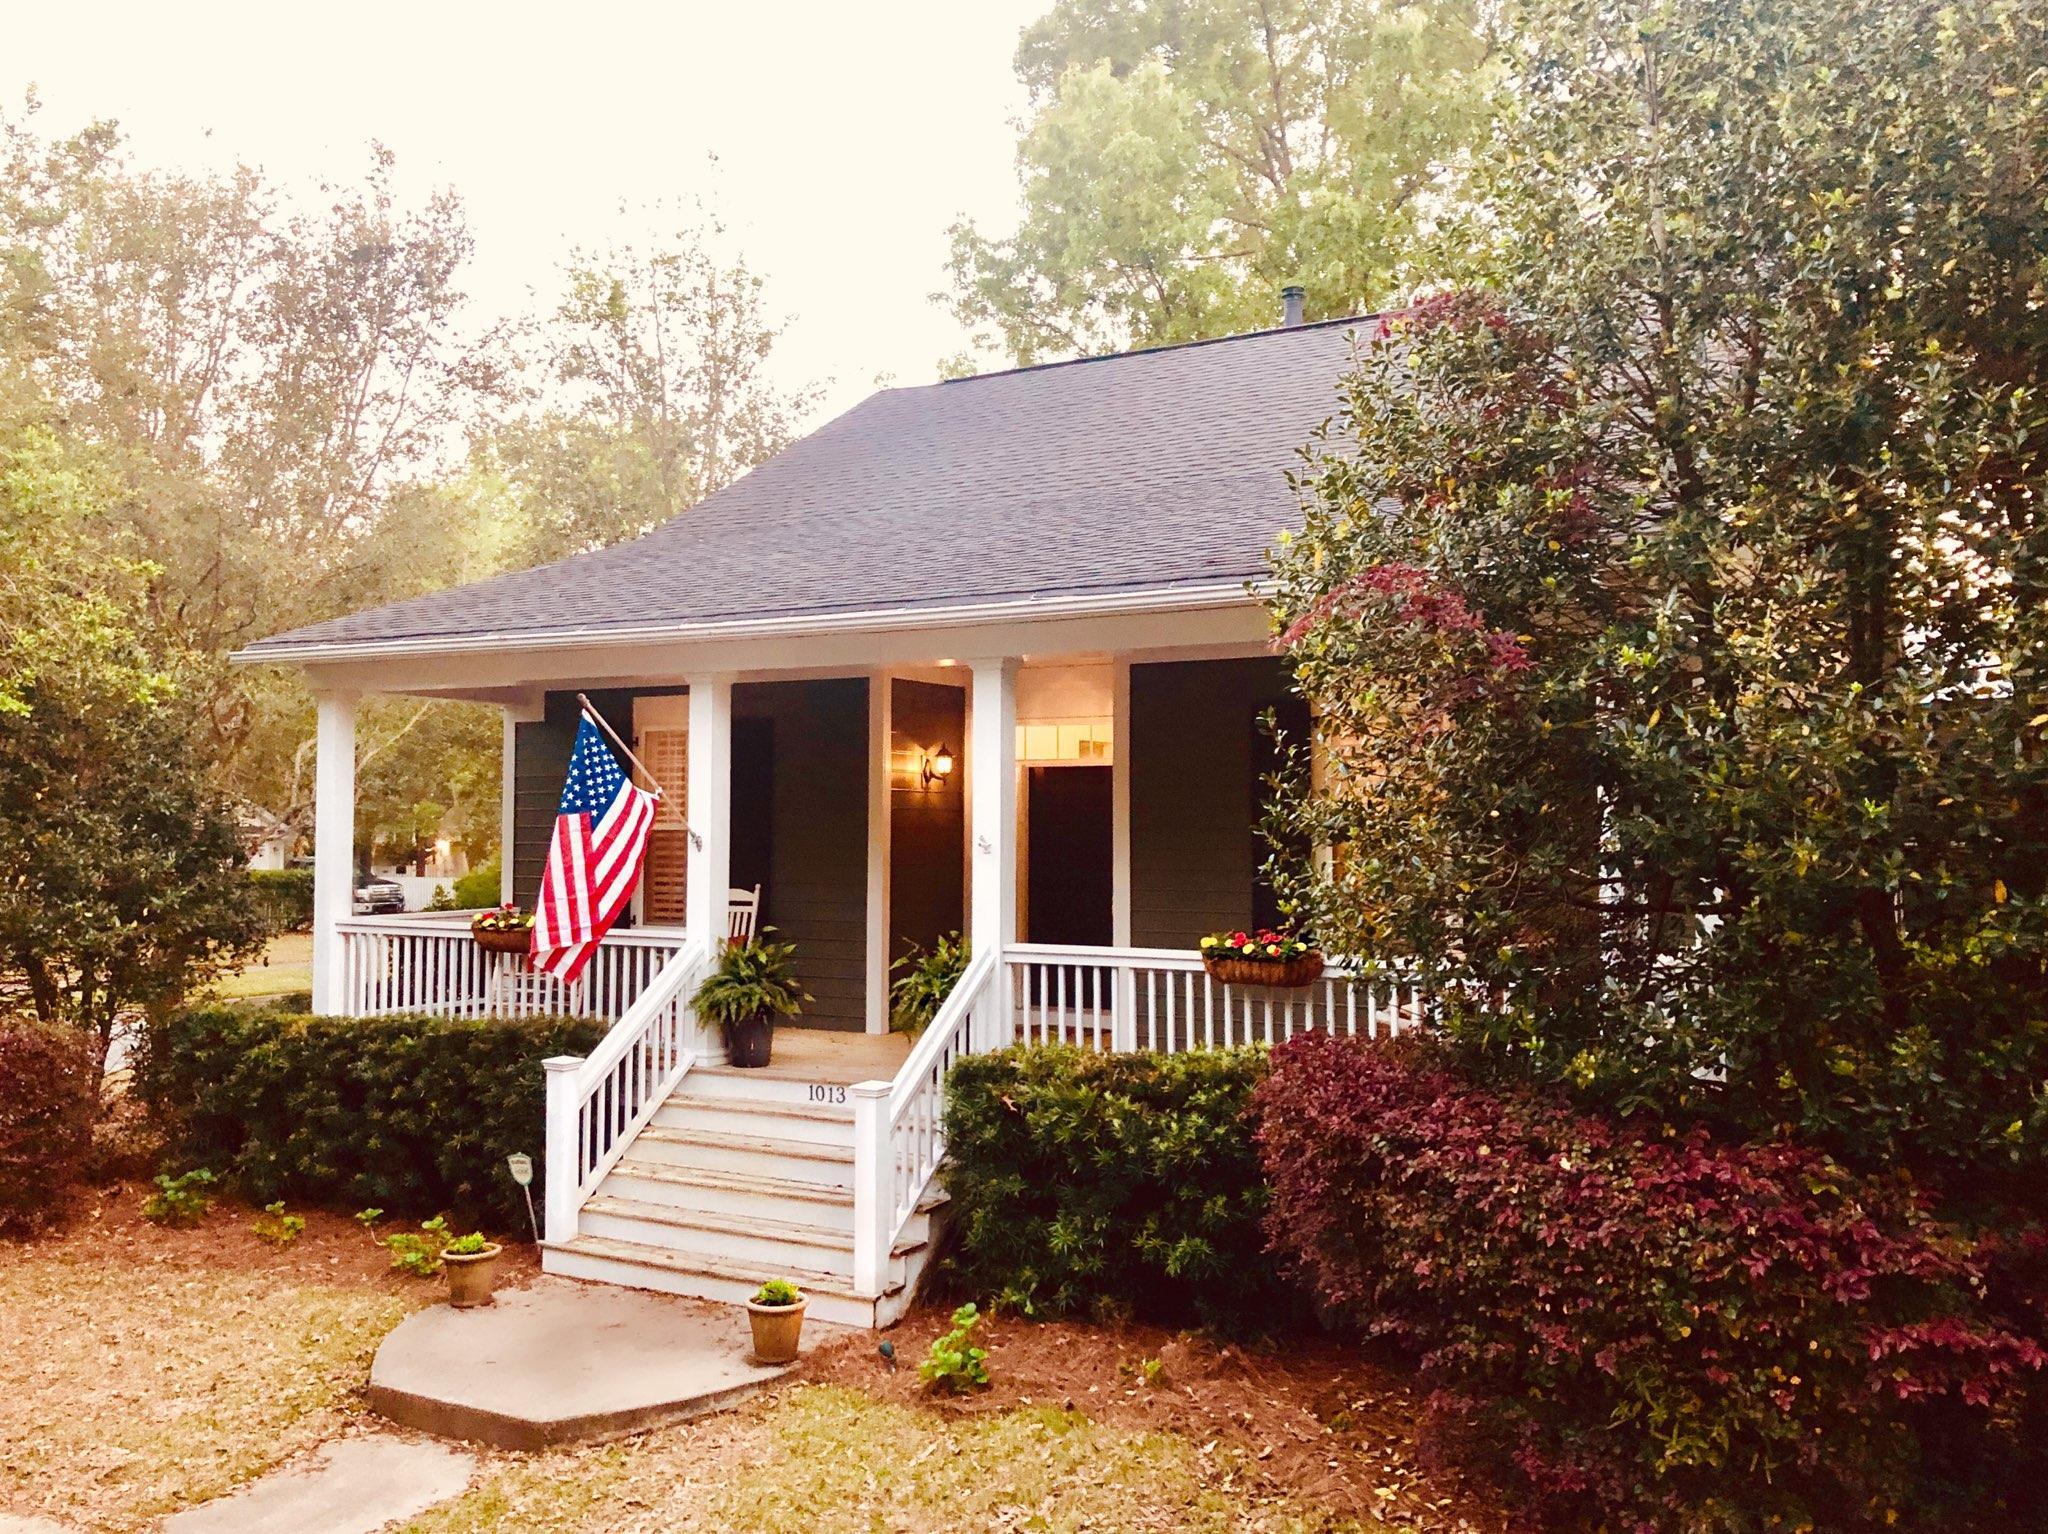 Daniel Island Homes For Sale - 1013 Barfield, Charleston, SC - 3